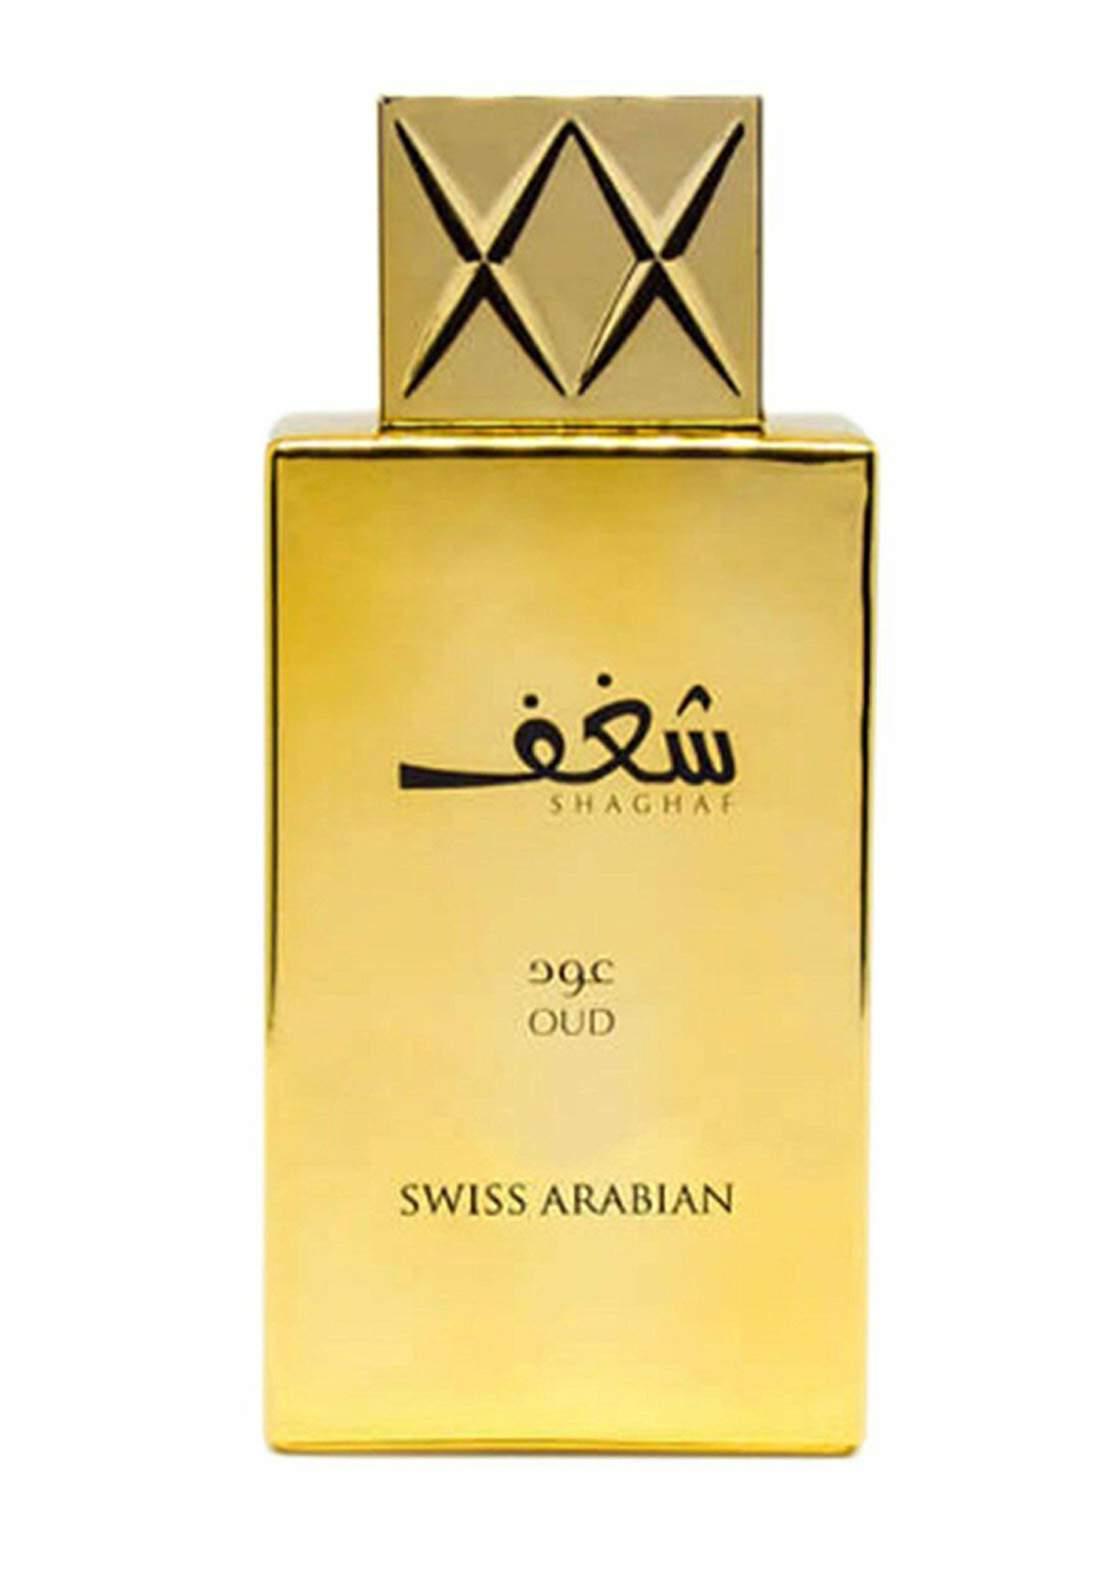 Swiss Arabian  985 Shaghaf Oud Eau De Parfum Unisex 75 ml عطر  لكلا الجنسين